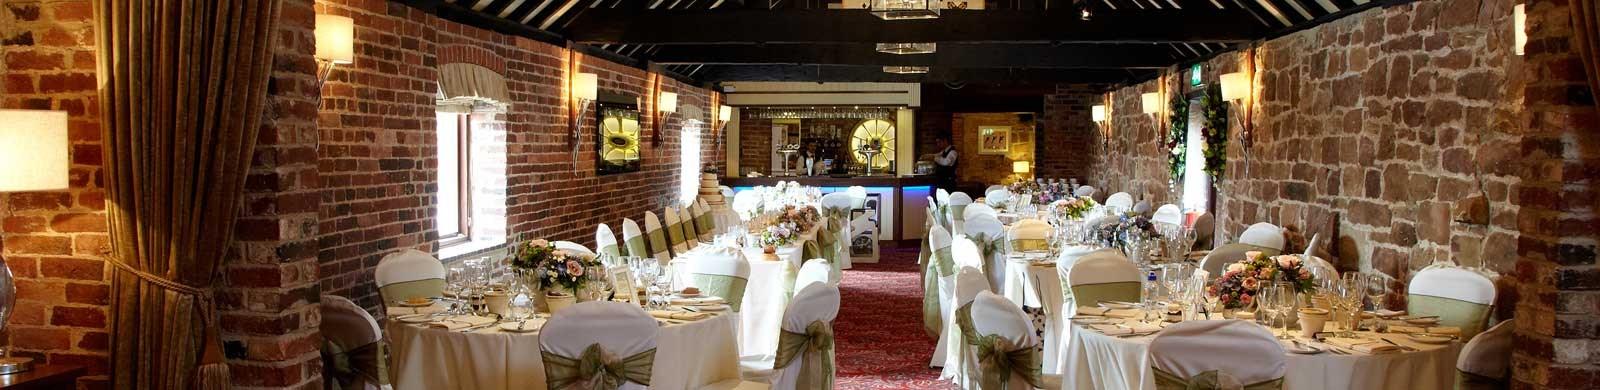 Wedding Special Offers Derby Derbyshire Grand Winter Whirlwind